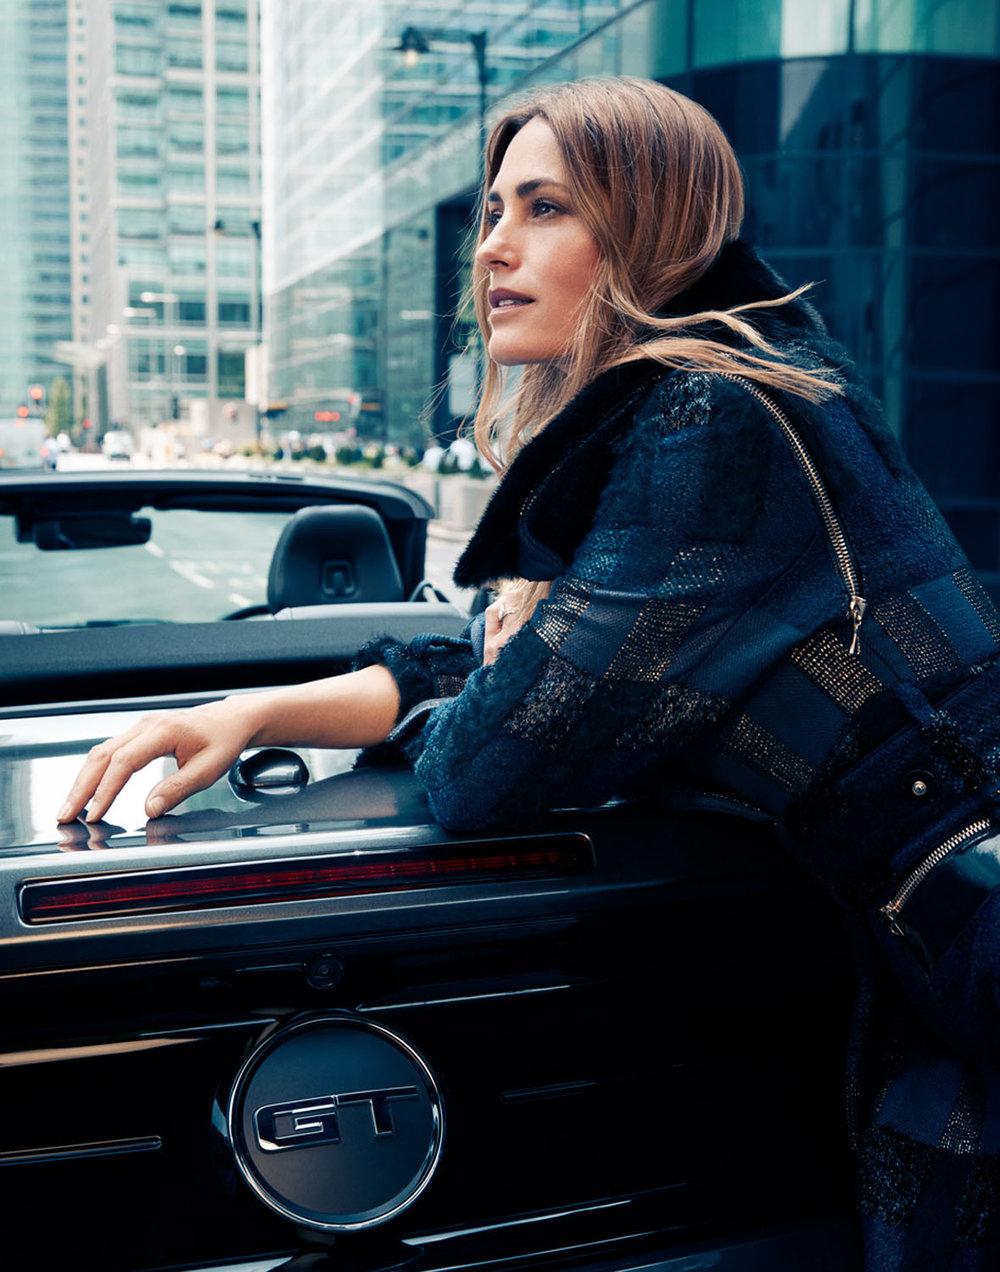 Vanity Fair UK September 2018 Yasmin Le Bon by Matt Holyoak (9).jpg